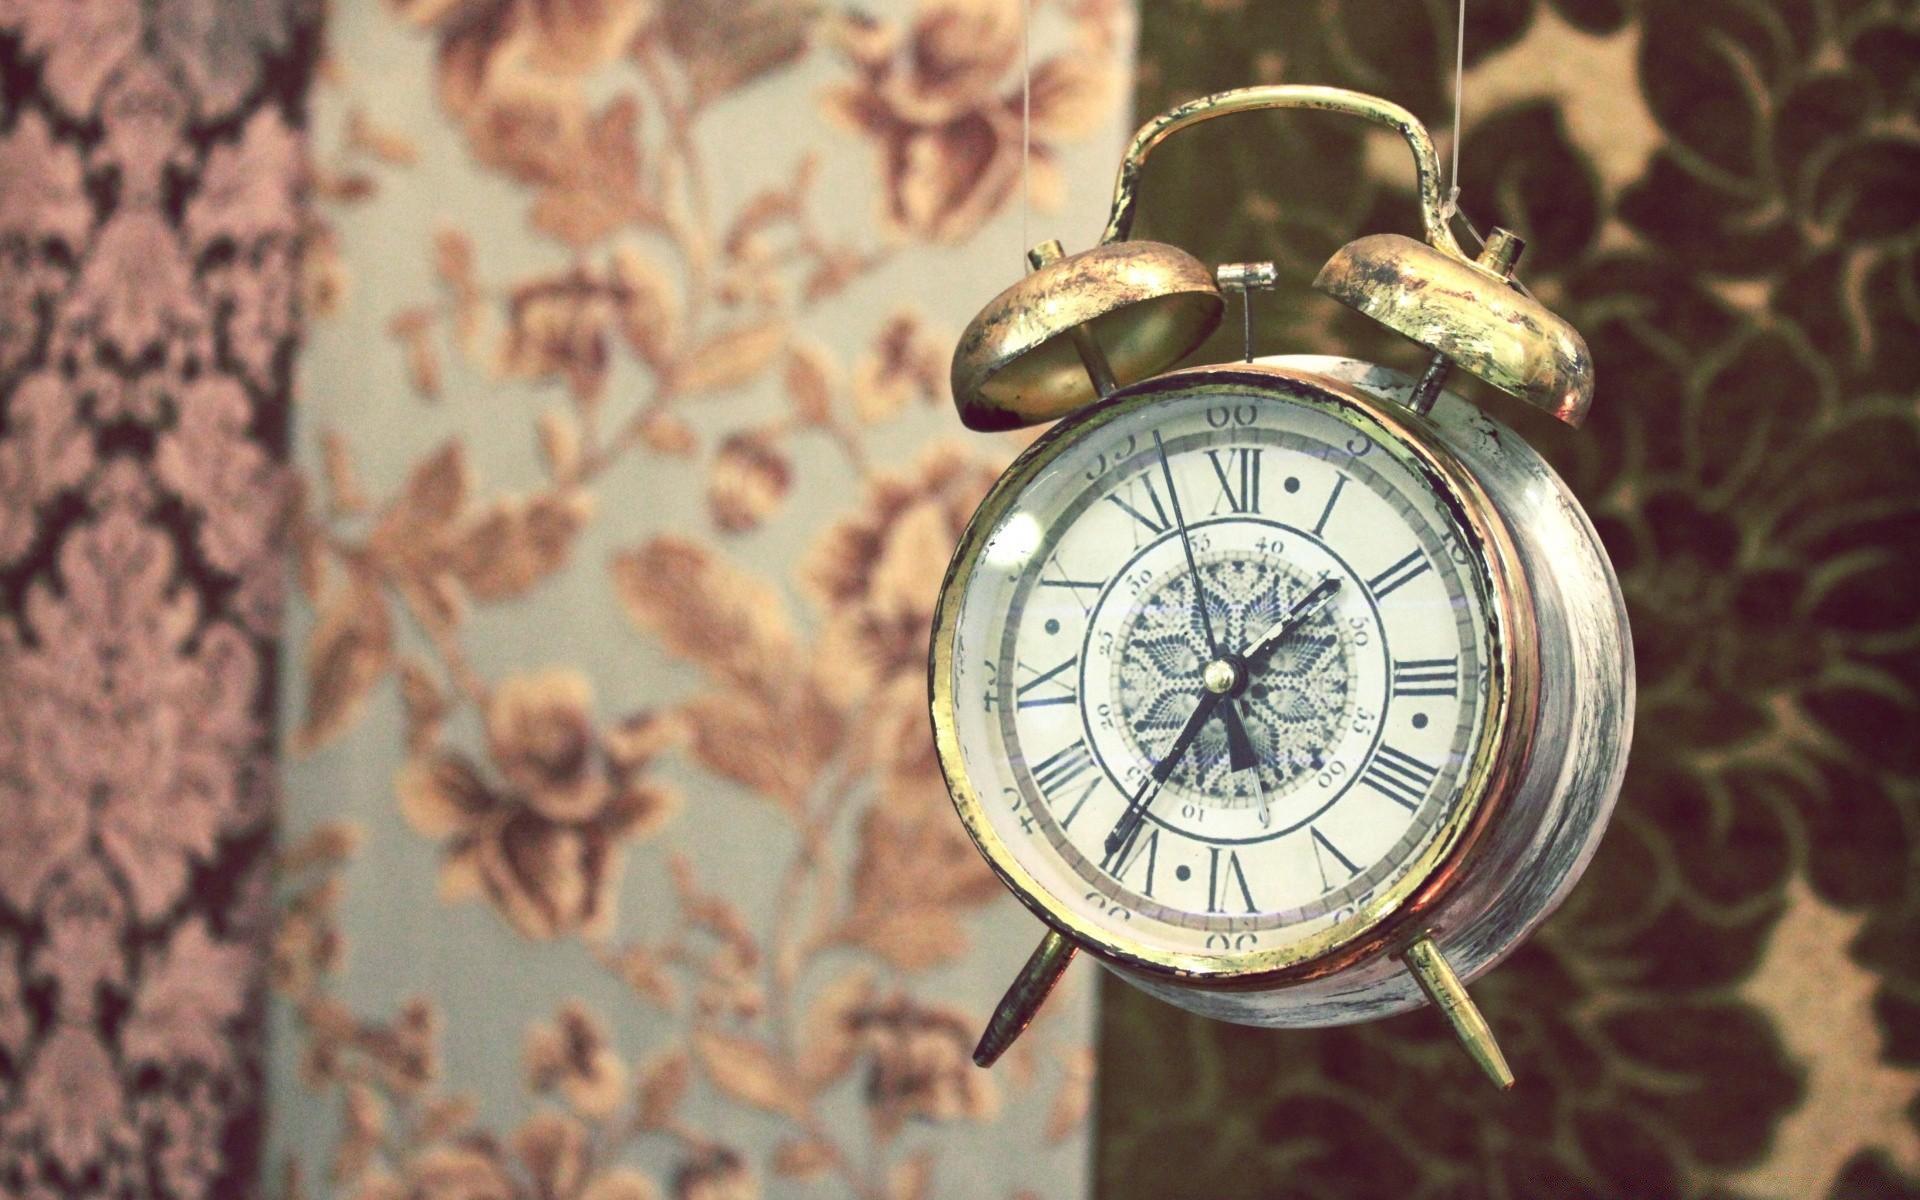 Vintage Antique Time Retro Old Clock Gold Watch Desktop - Scrapear - HD Wallpaper